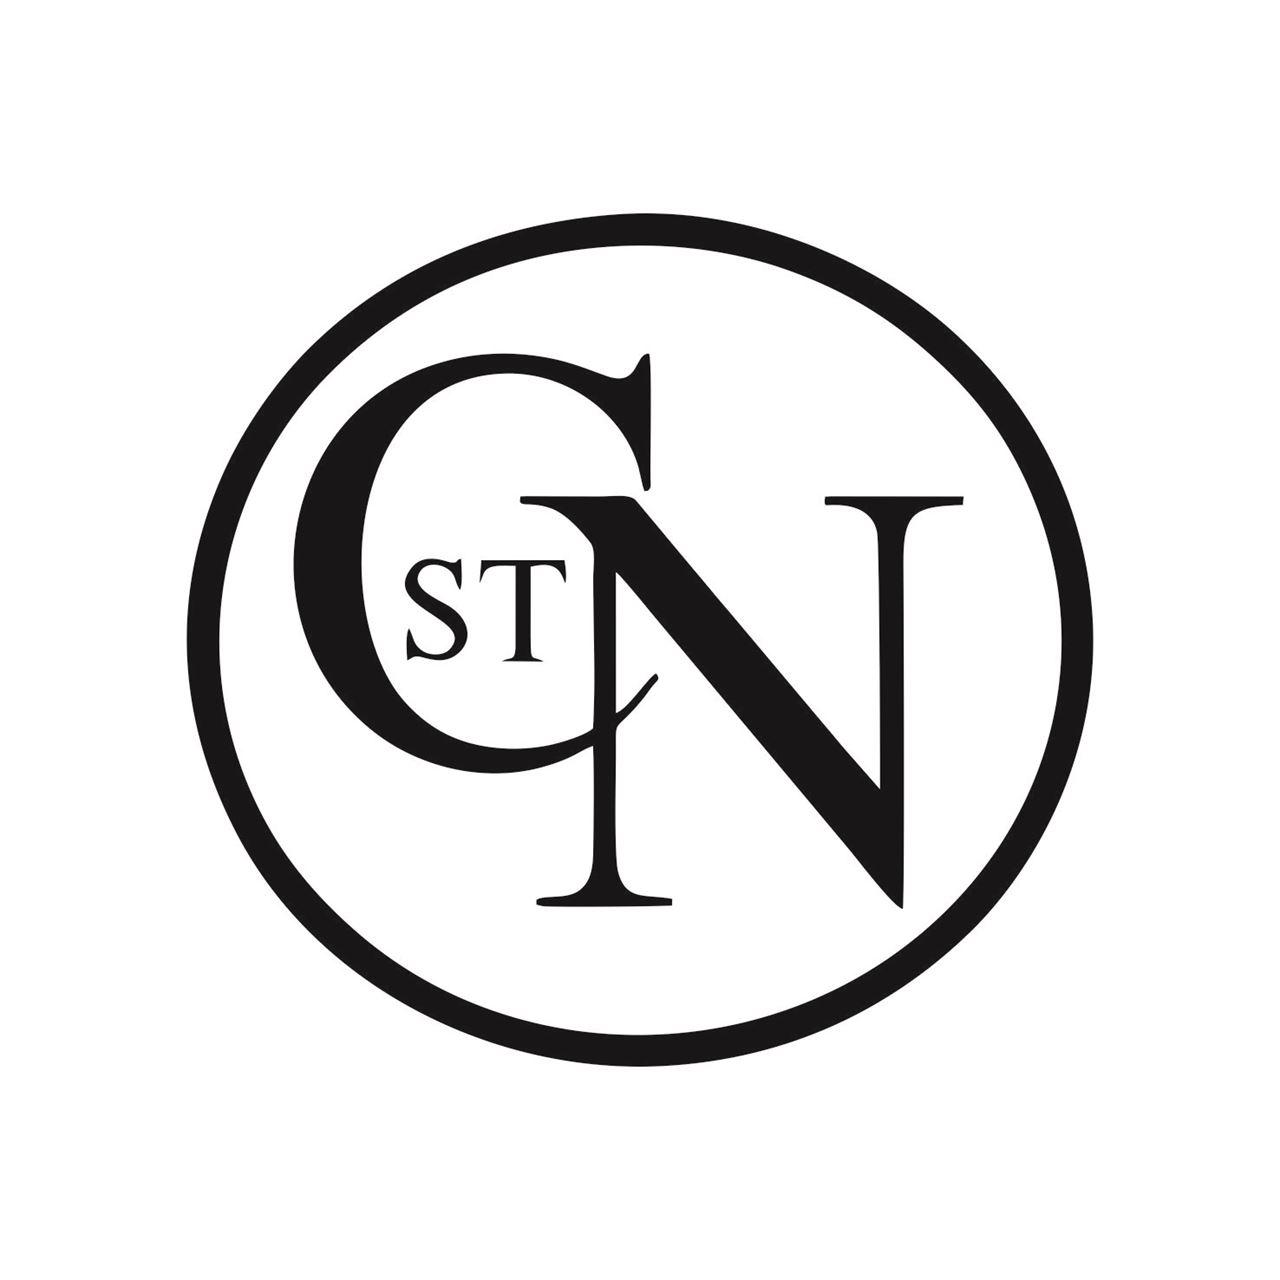 Club Image for Combe St Nicholas